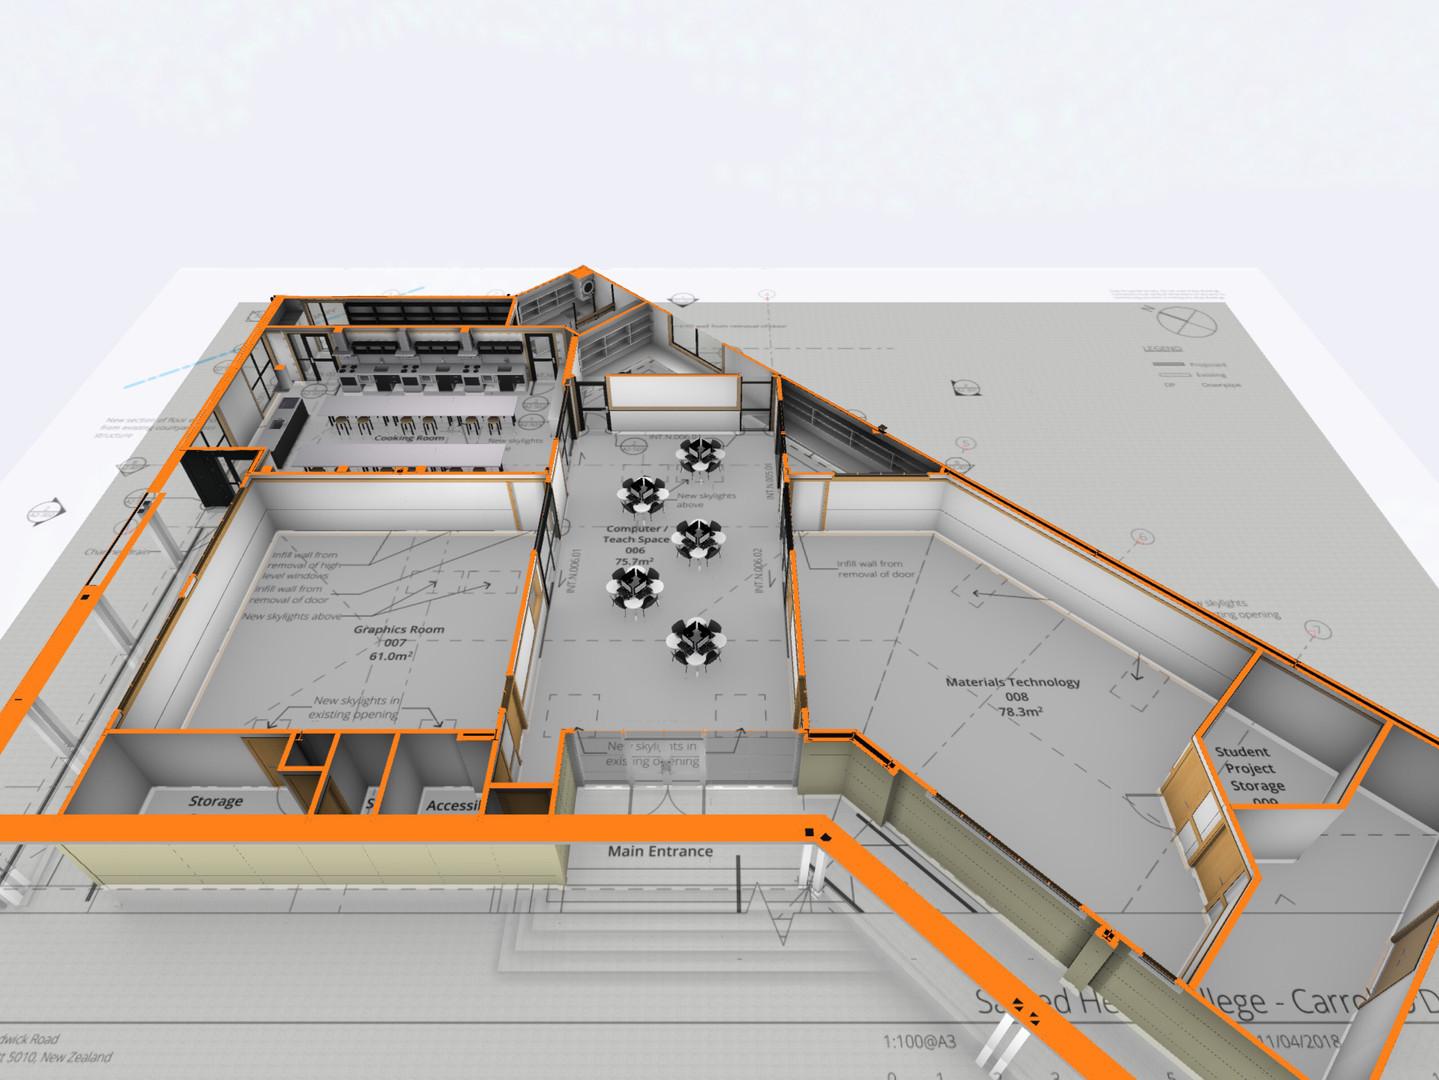 Sacred-Heart-College-Carrol-O'Donovan-6-3D-proposed-plan.jpeg